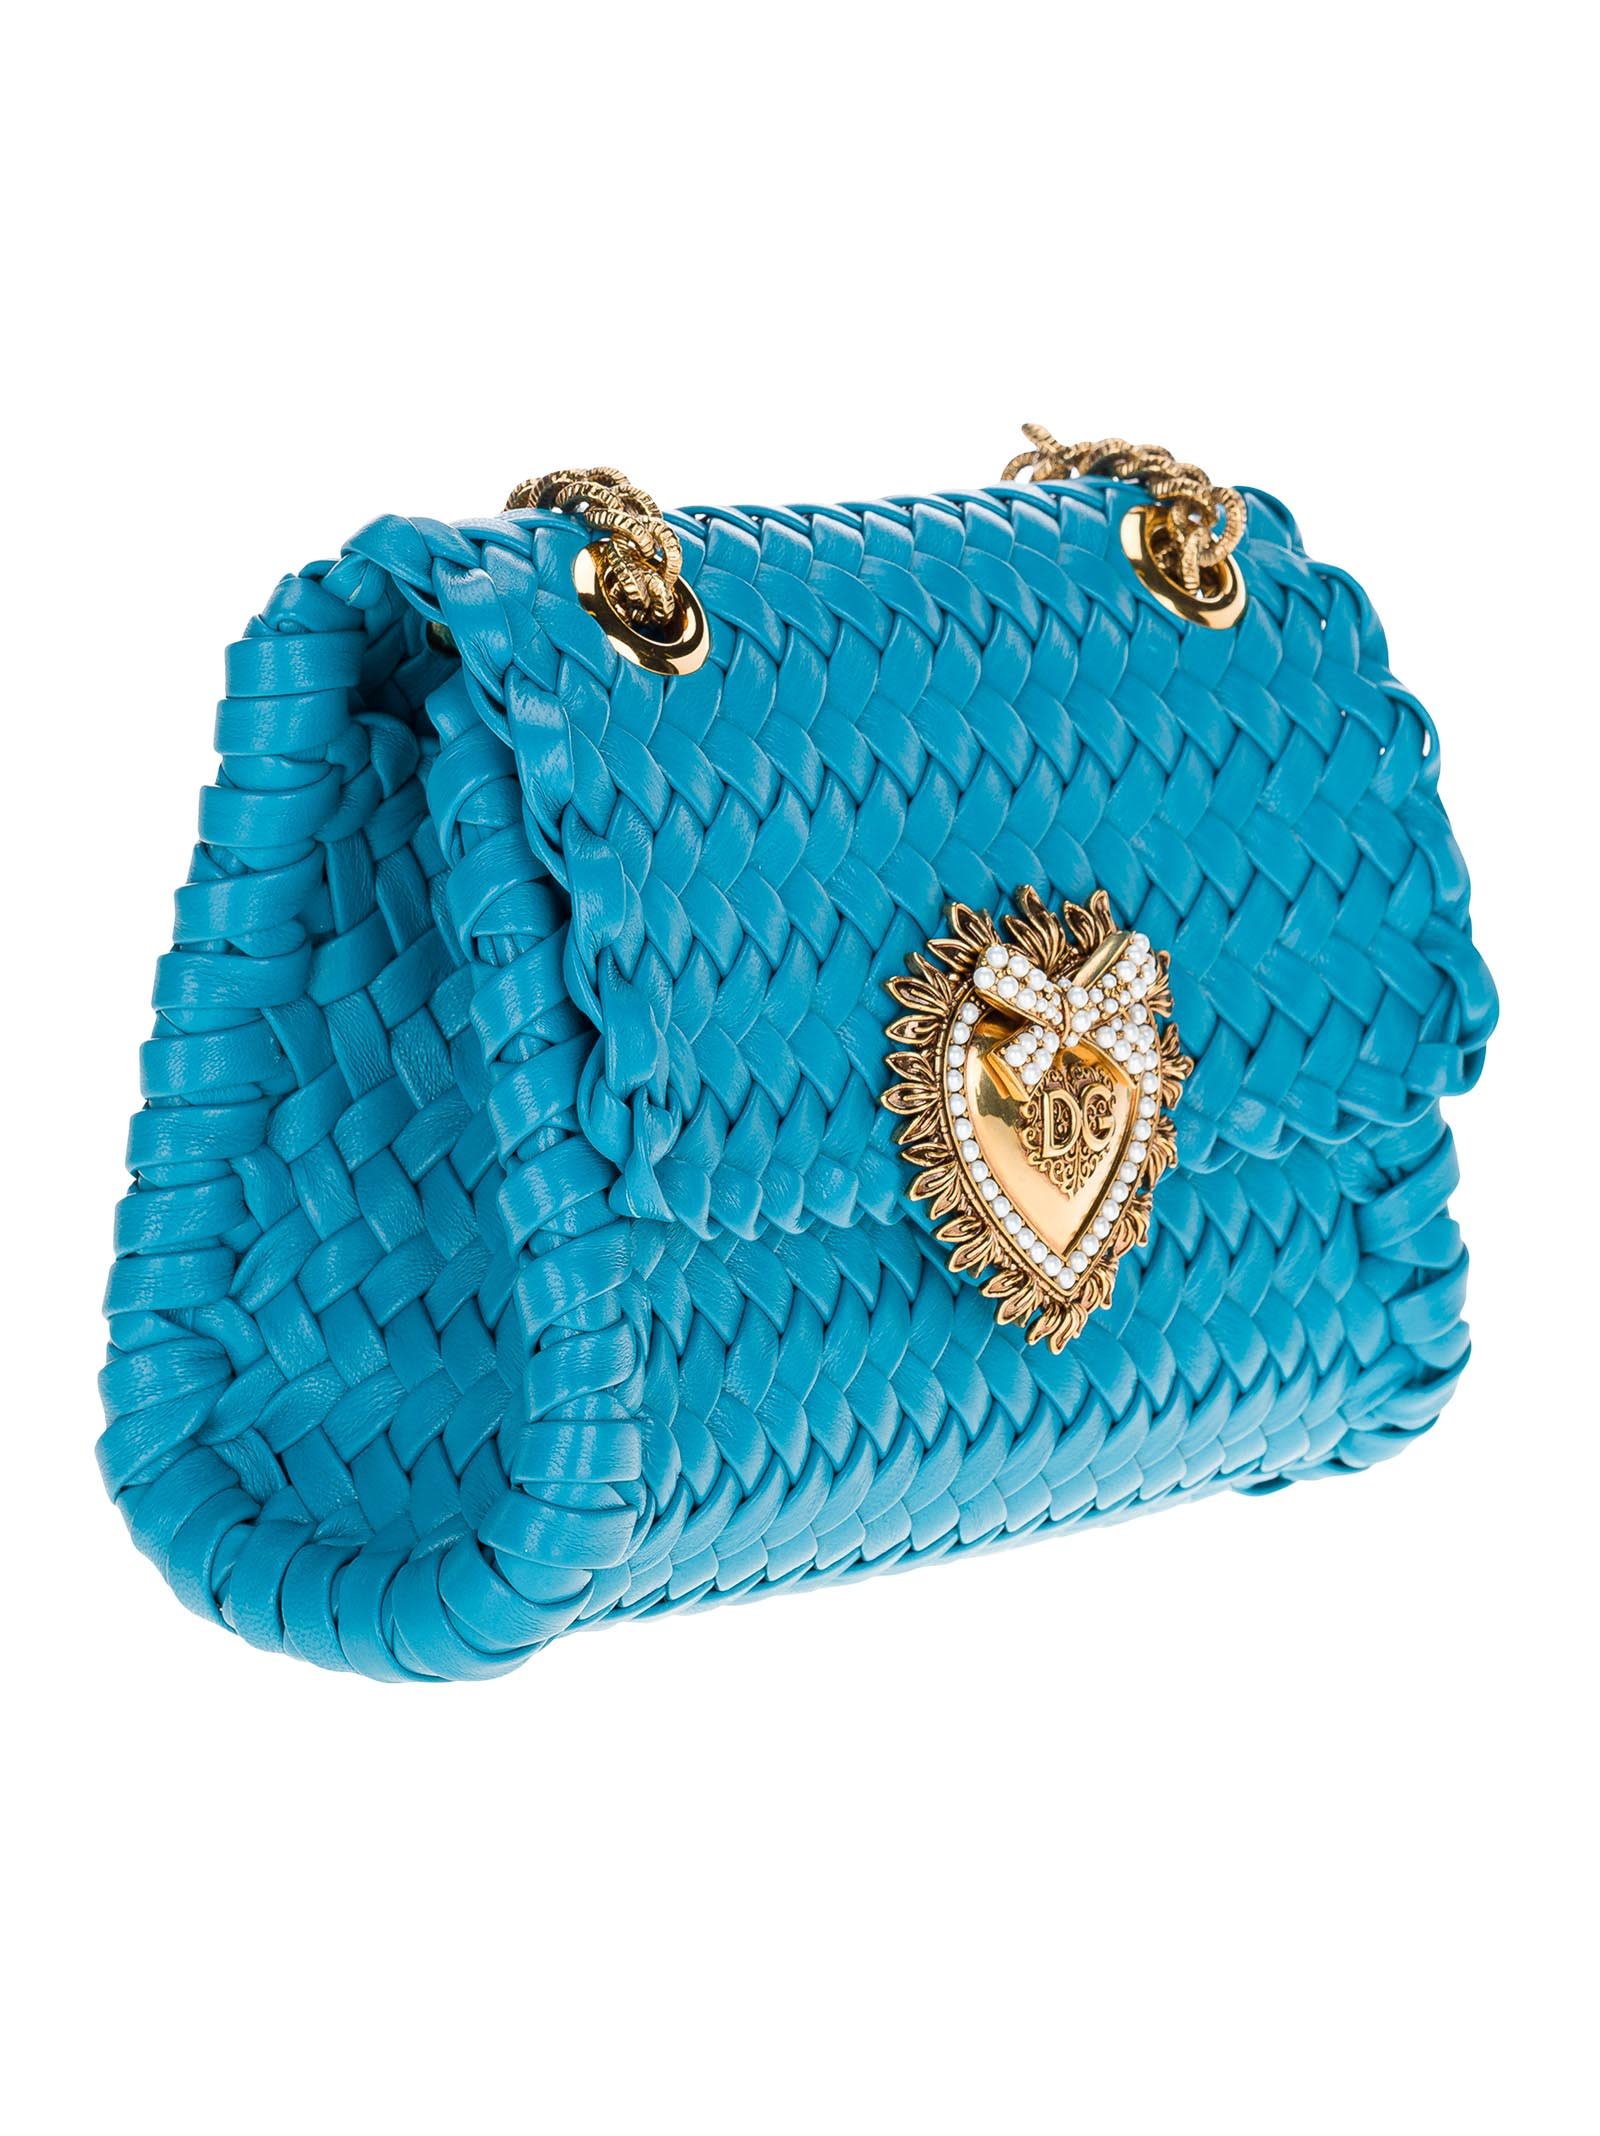 Dolce & Gabbana DOLCE & GABBANA SMALL DEVOTION SHOULDER BAG IN WOVEN NAPPA LEATHER